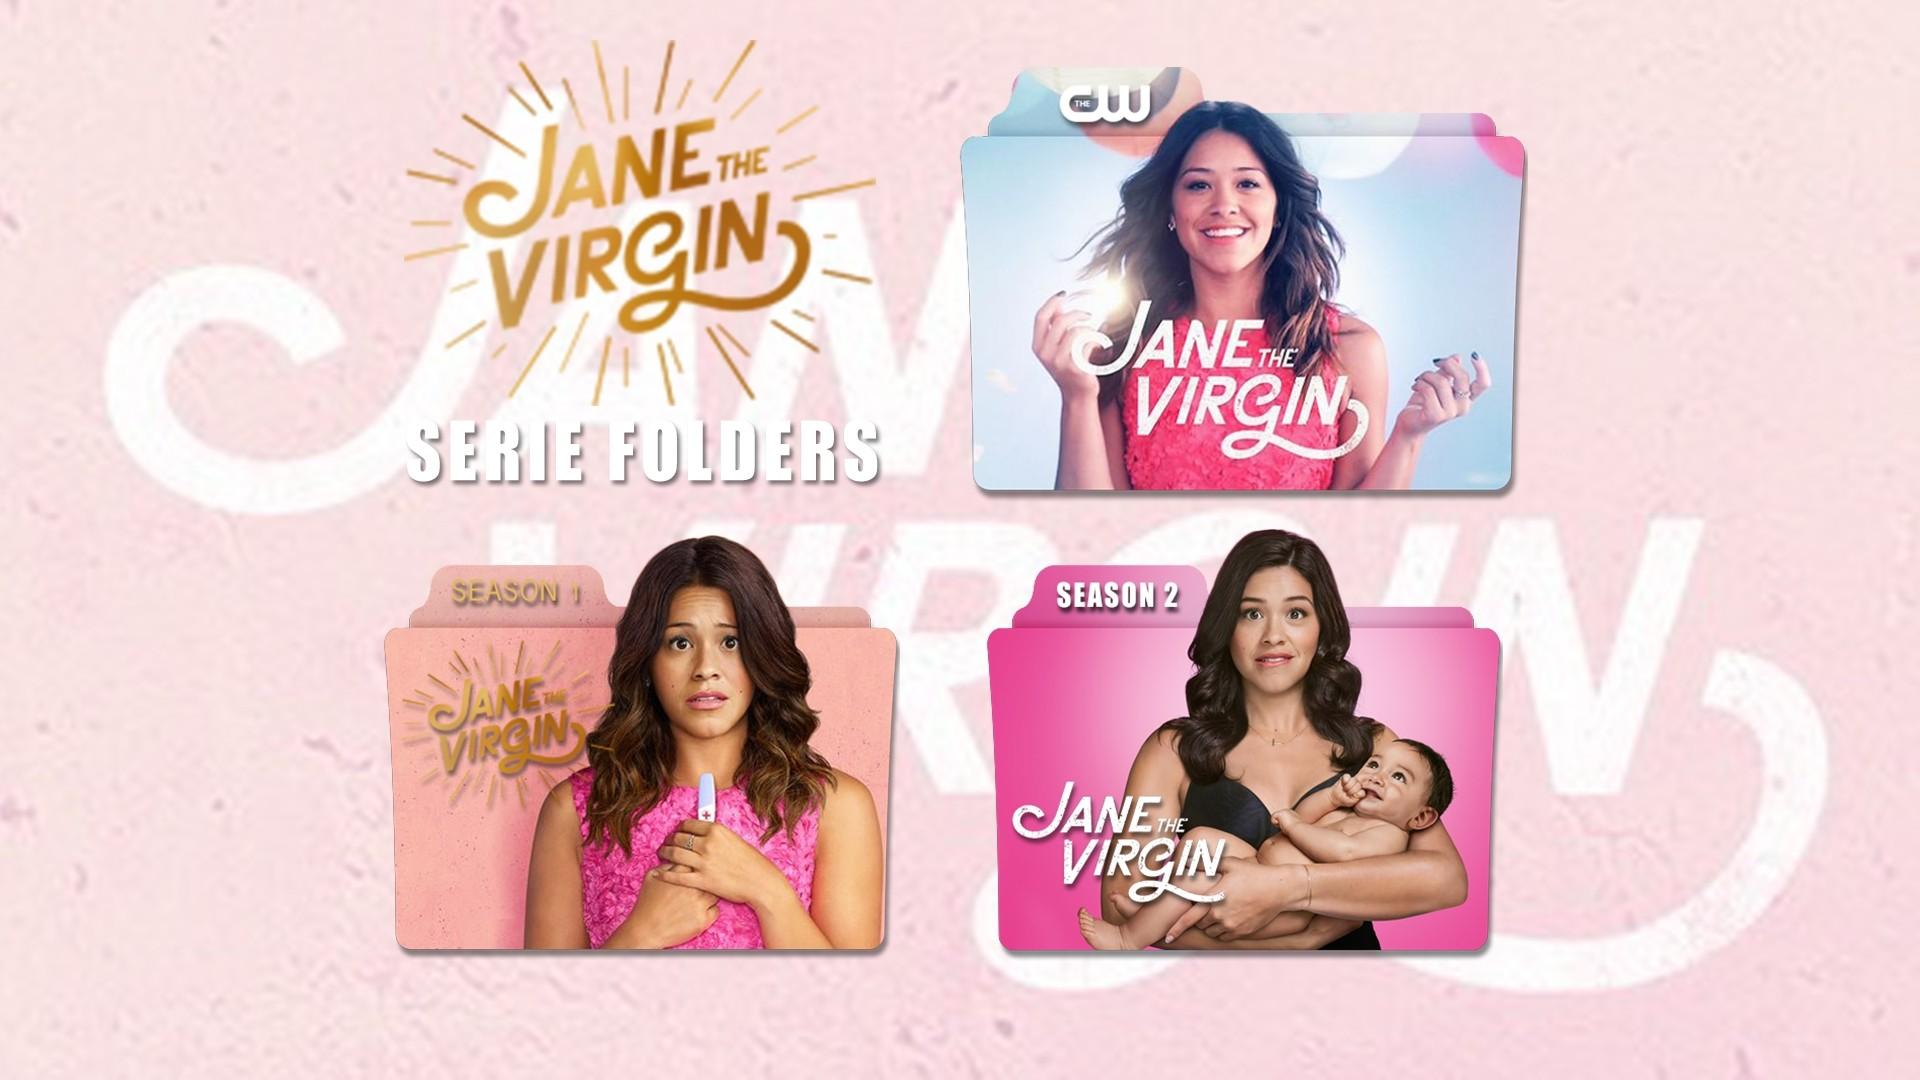 Jane The Virgin hd wallpaper download